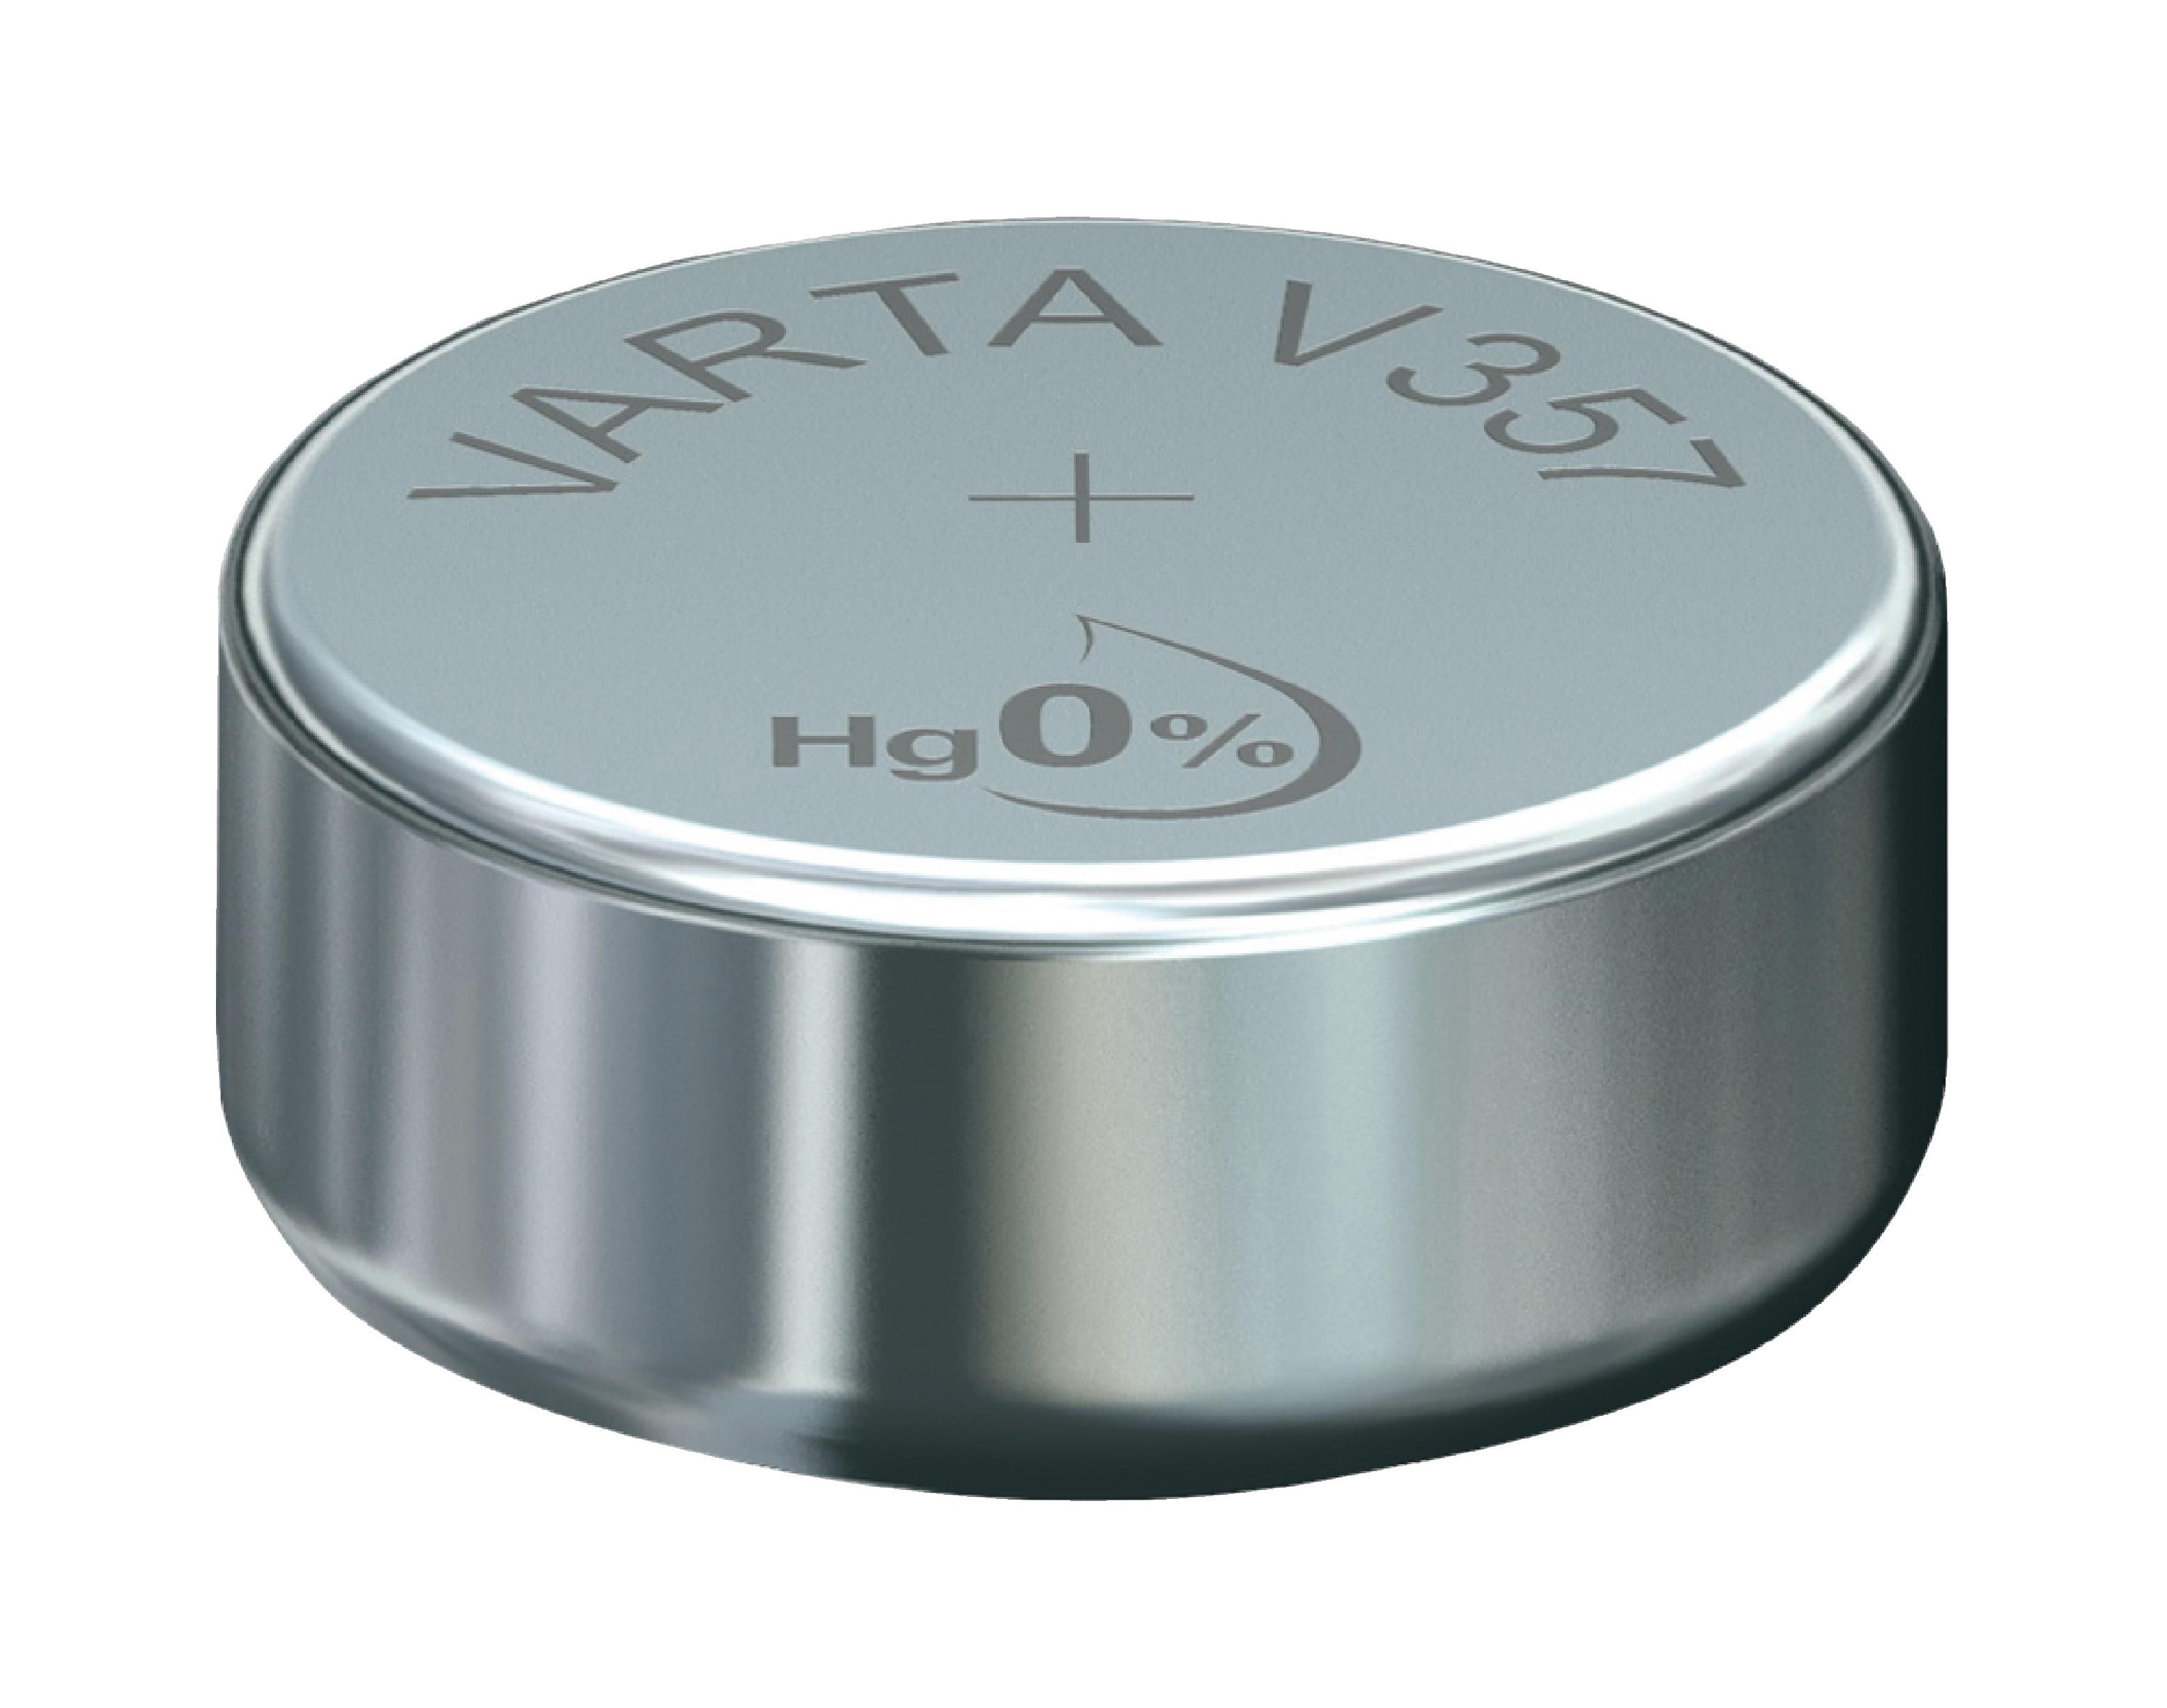 Stříbro-oxidová Baterie SR44 1.55 V 155 mAh 1-Balíček